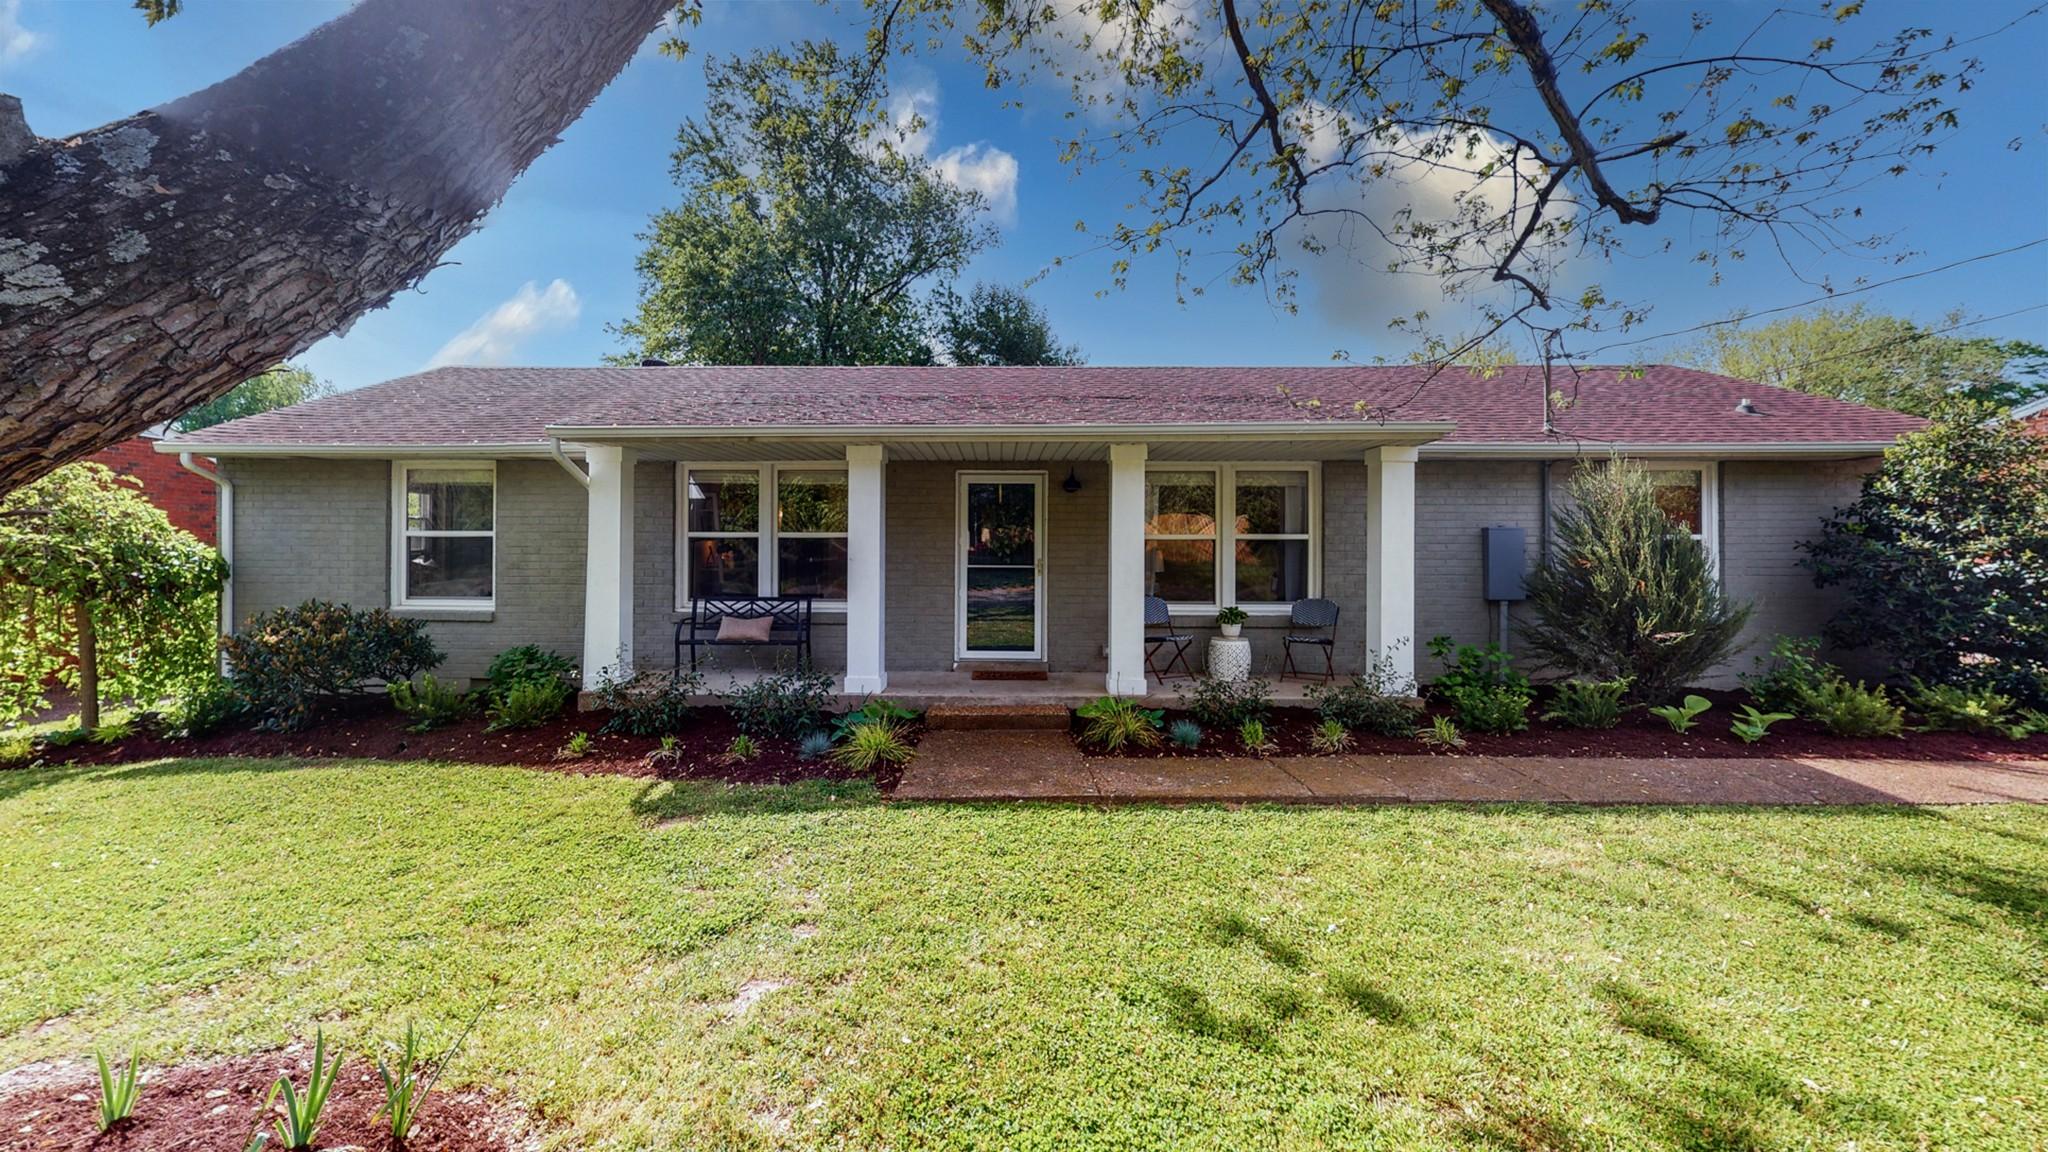 301 Cathy Jo Dr Property Photo - Nashville, TN real estate listing